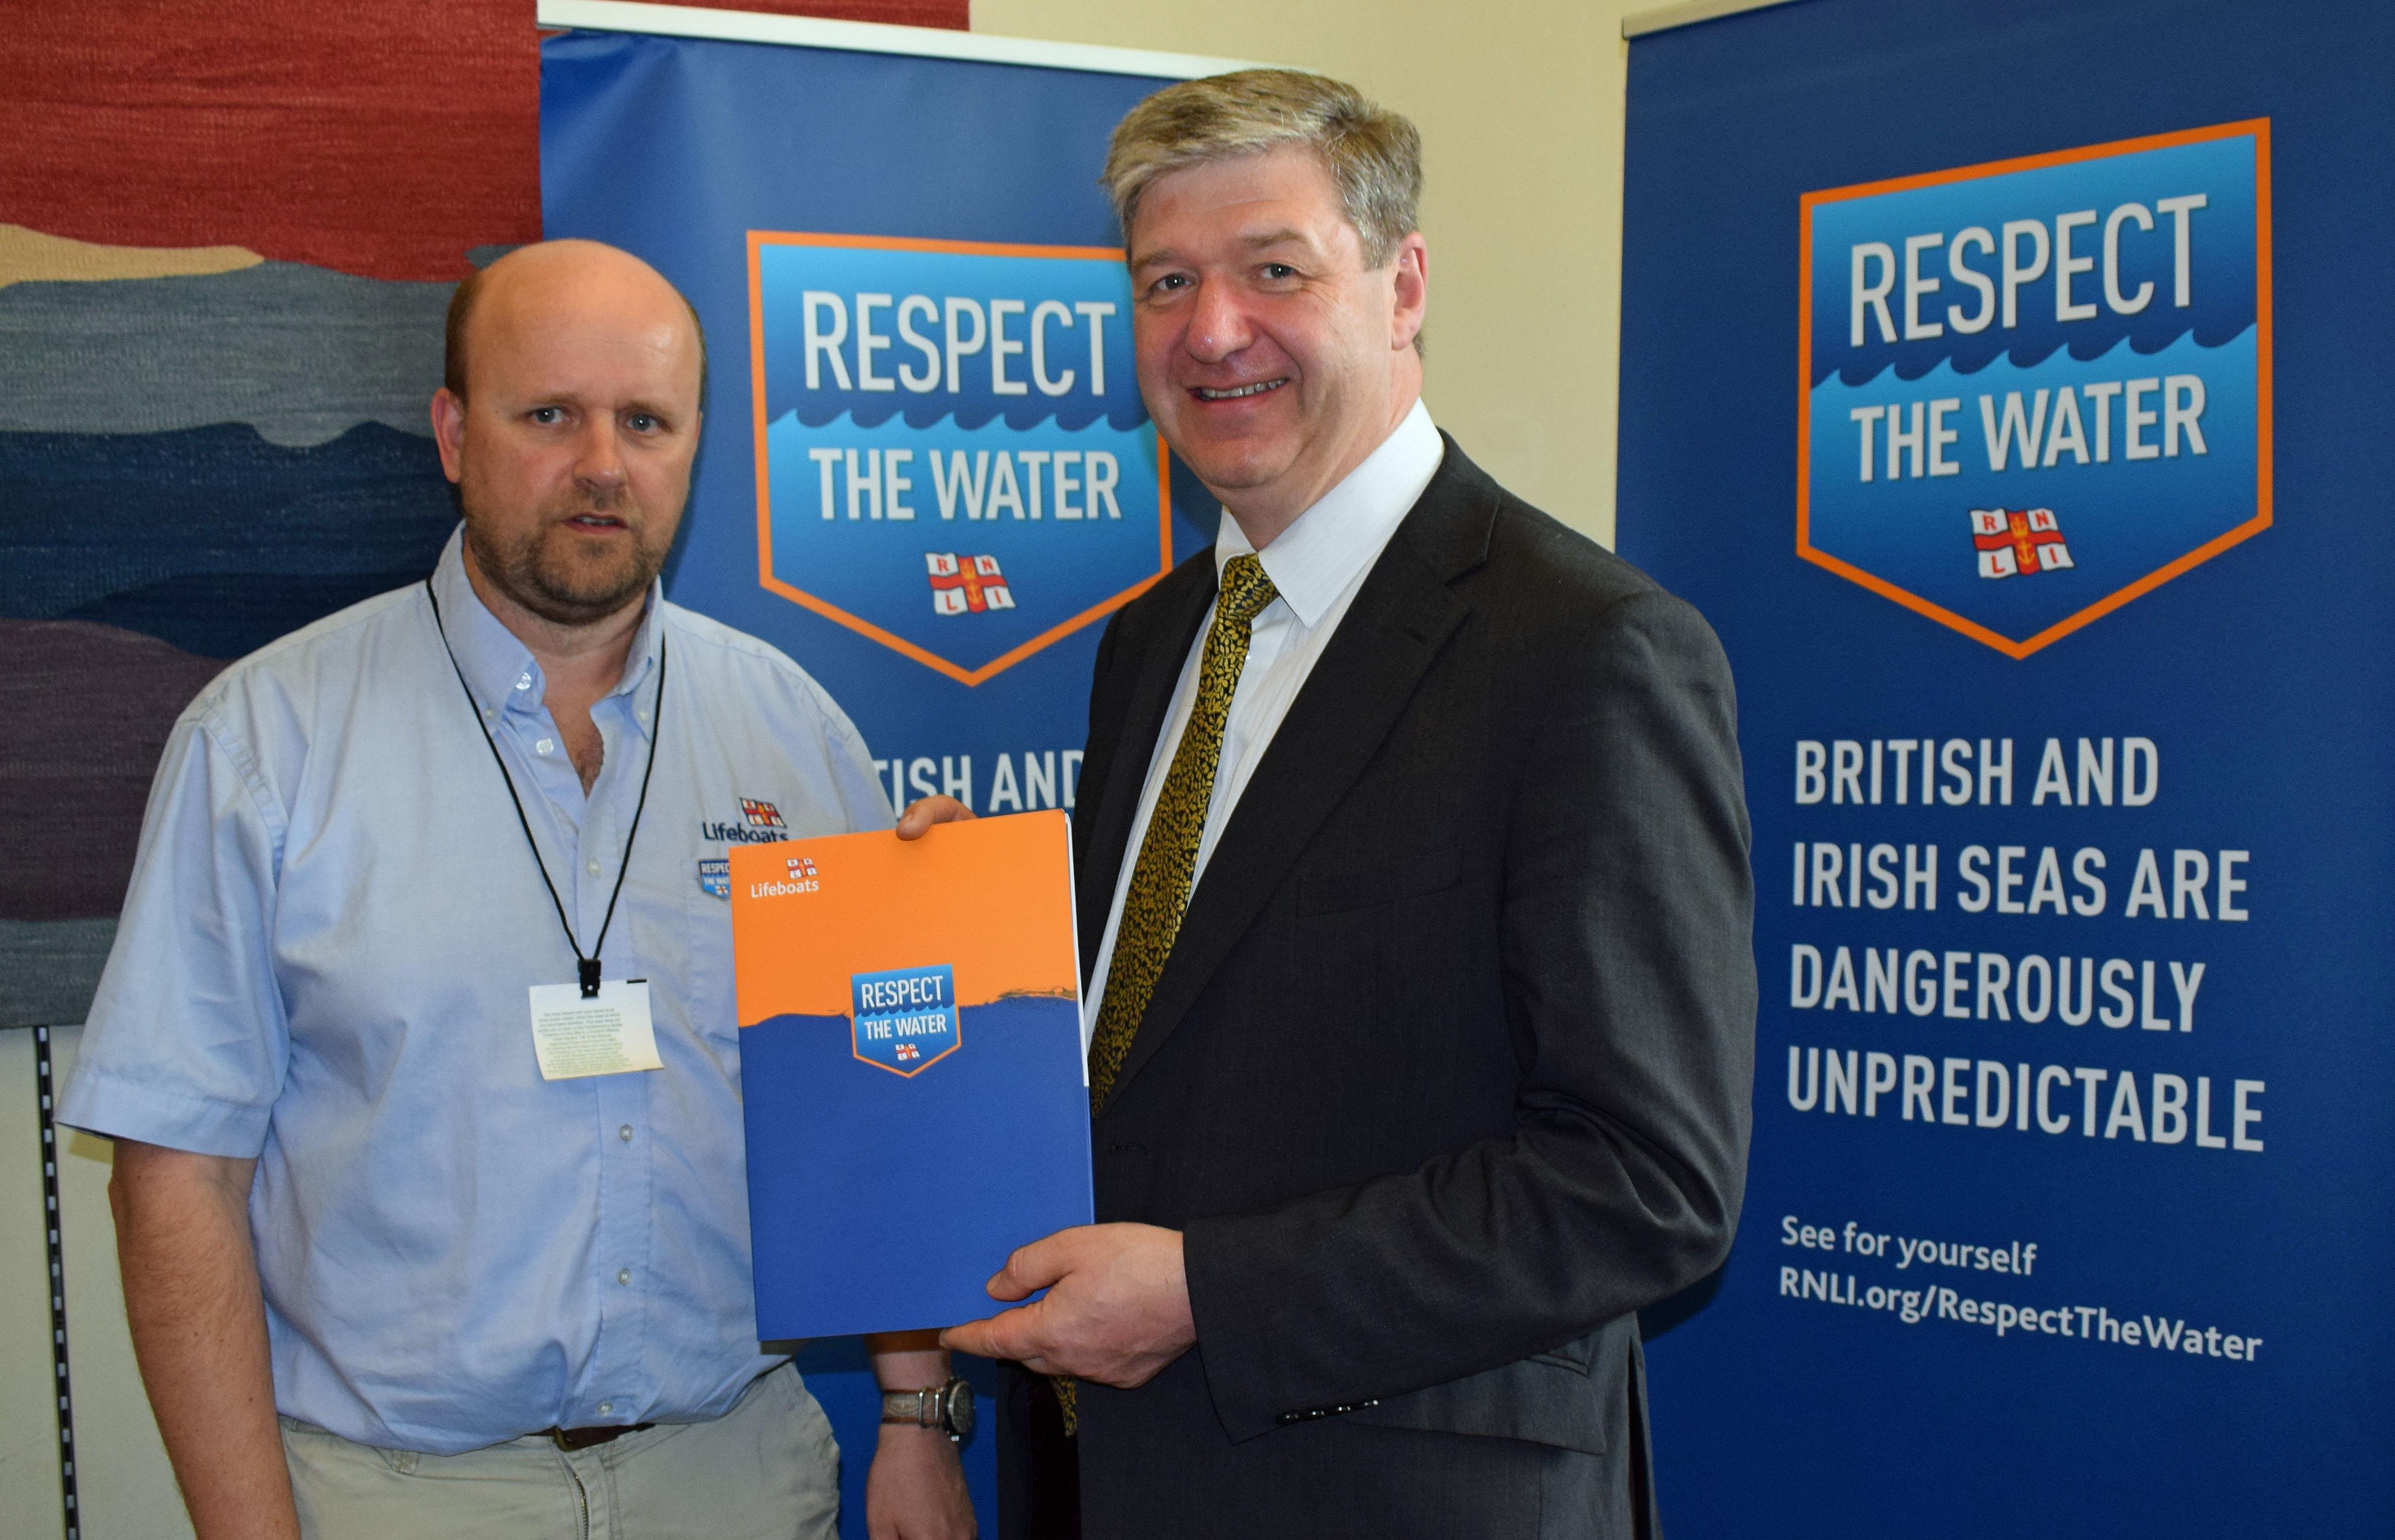 Alistair_Carmichael_(002).jpg_Respect_the_water_campaign_Jun_16.jpg